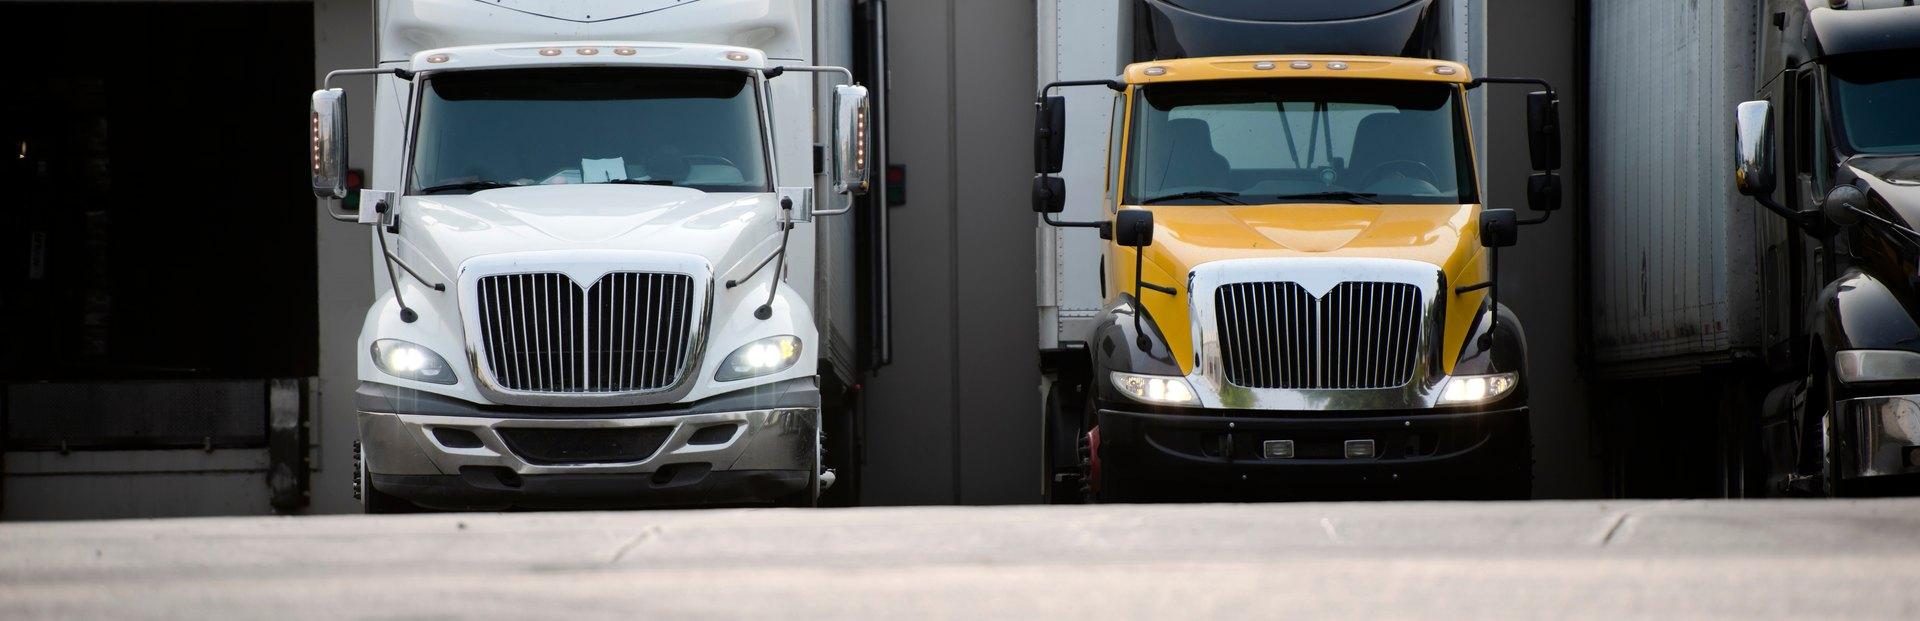 Logistics transportation services - costs ways to reduce